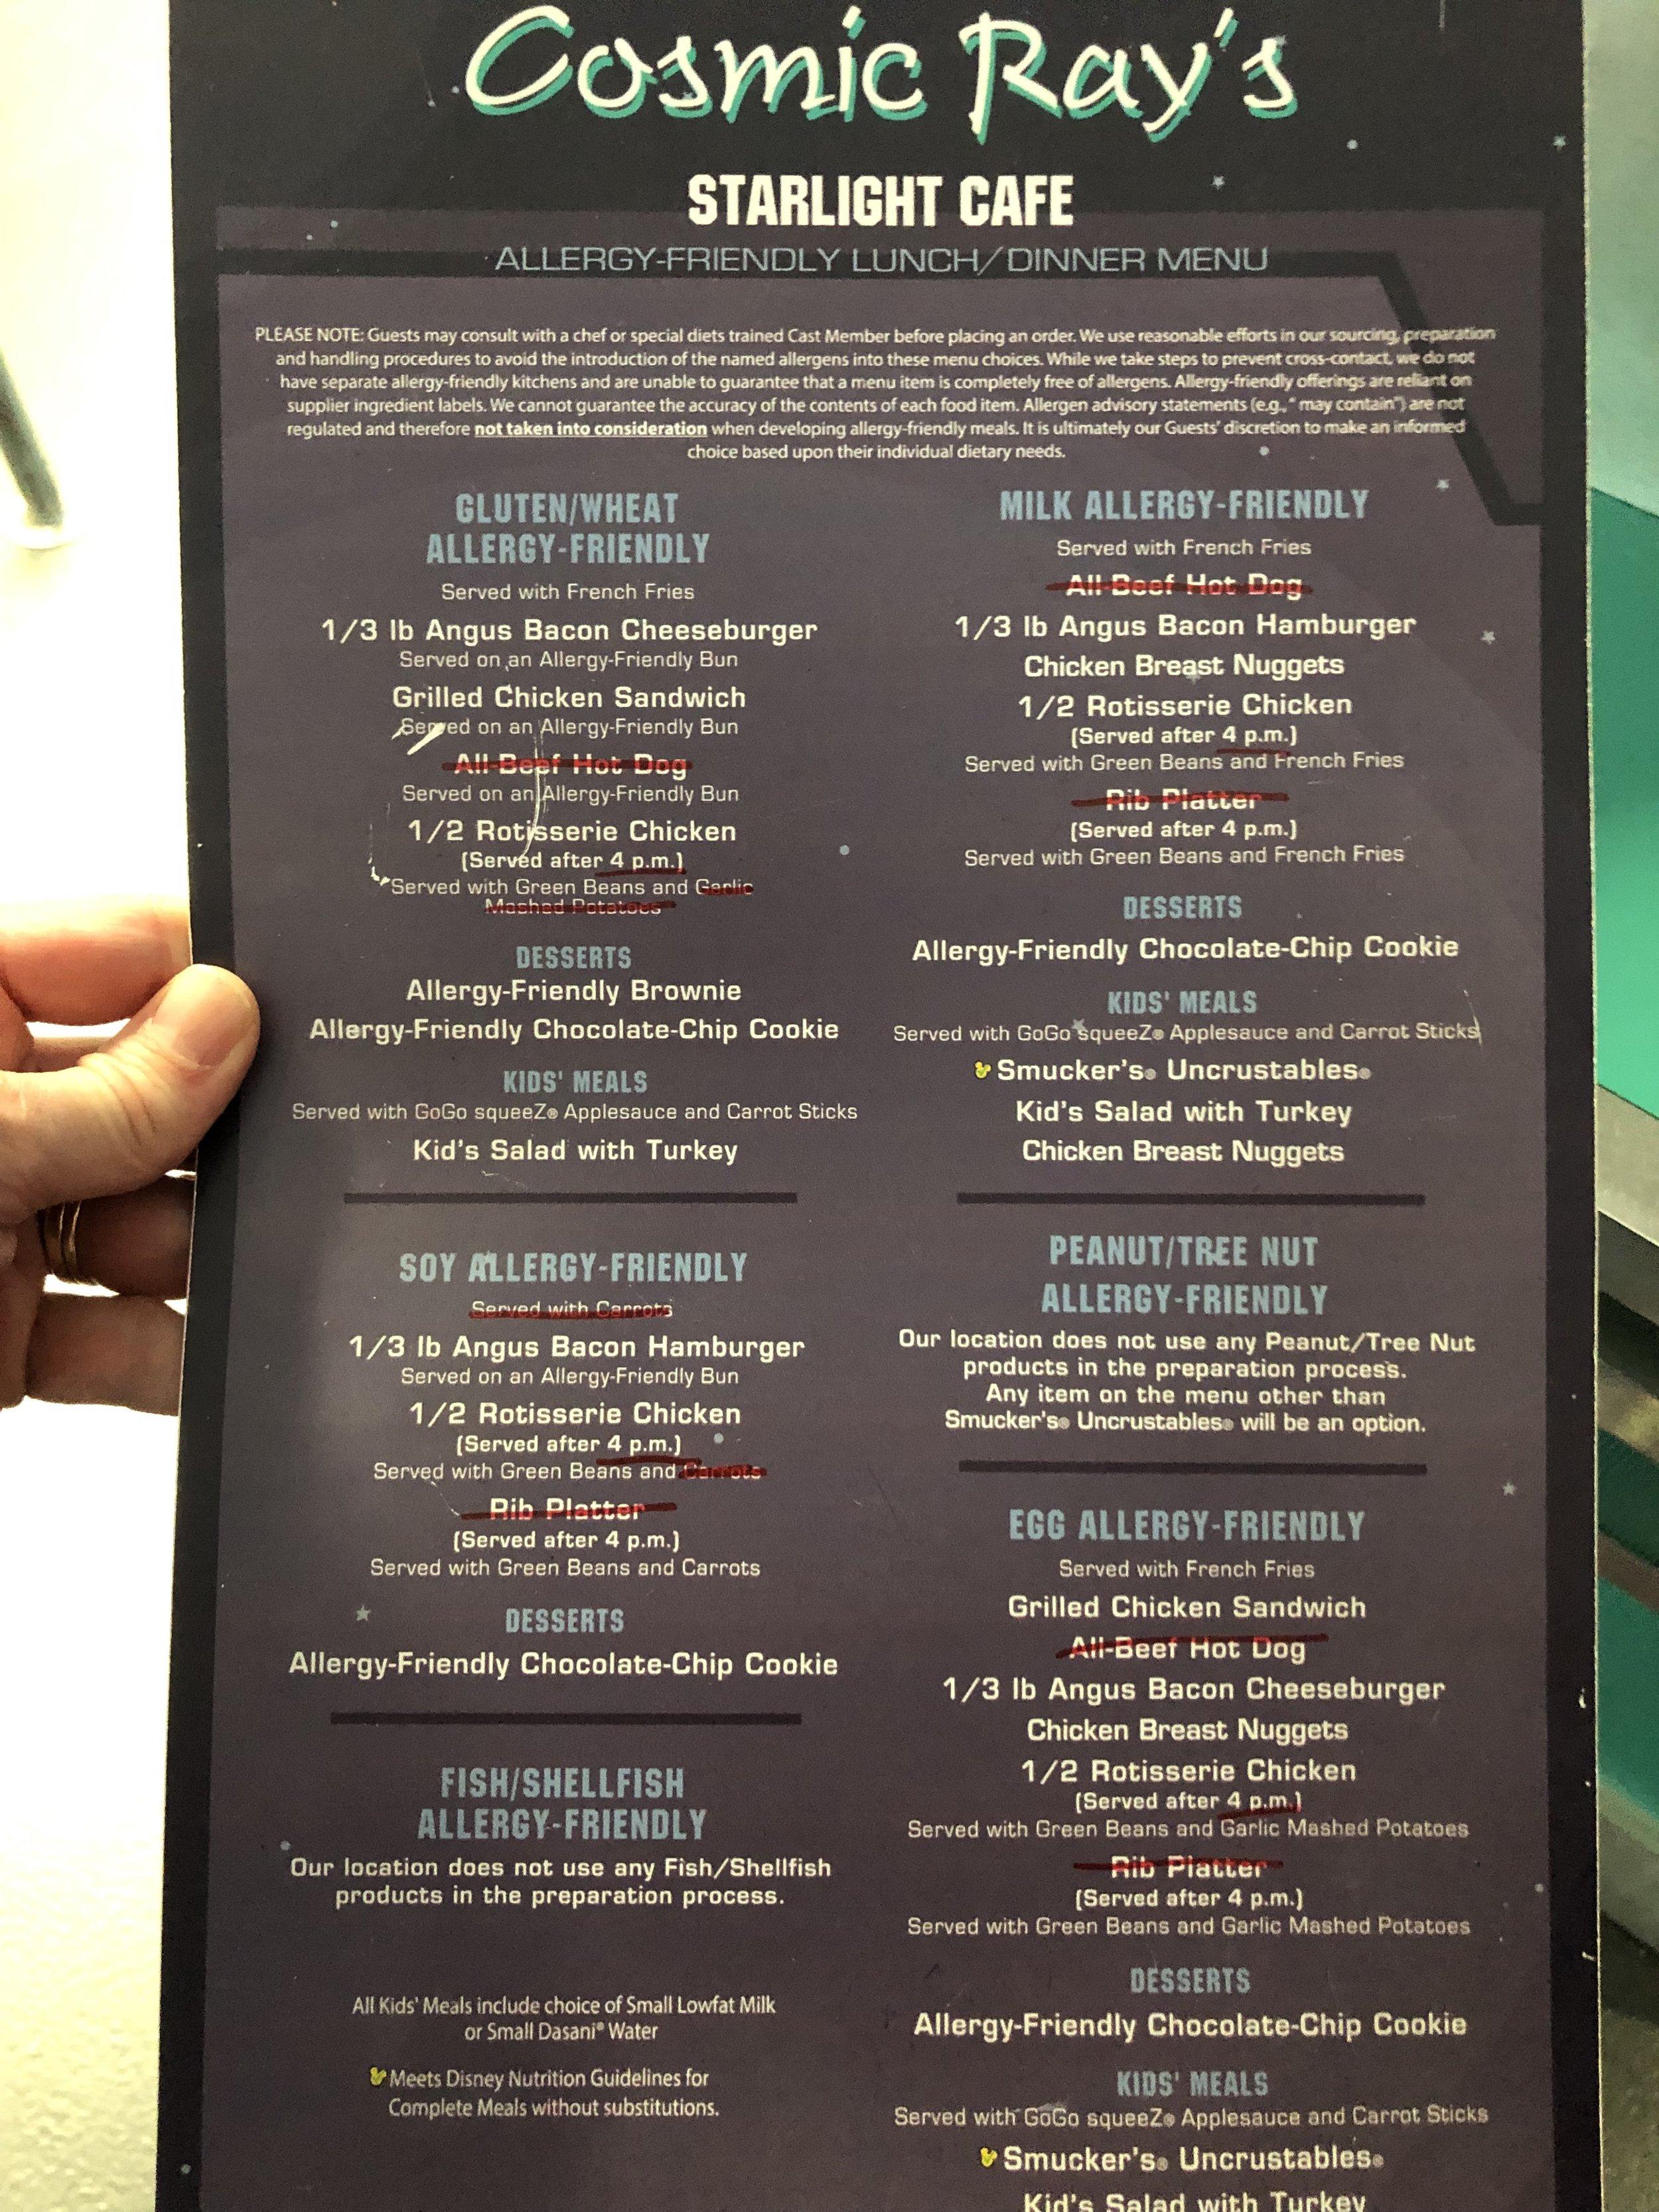 Cosmic Ray's Starlight Cafe Allergy Menu in Tomorrowland at Disney World